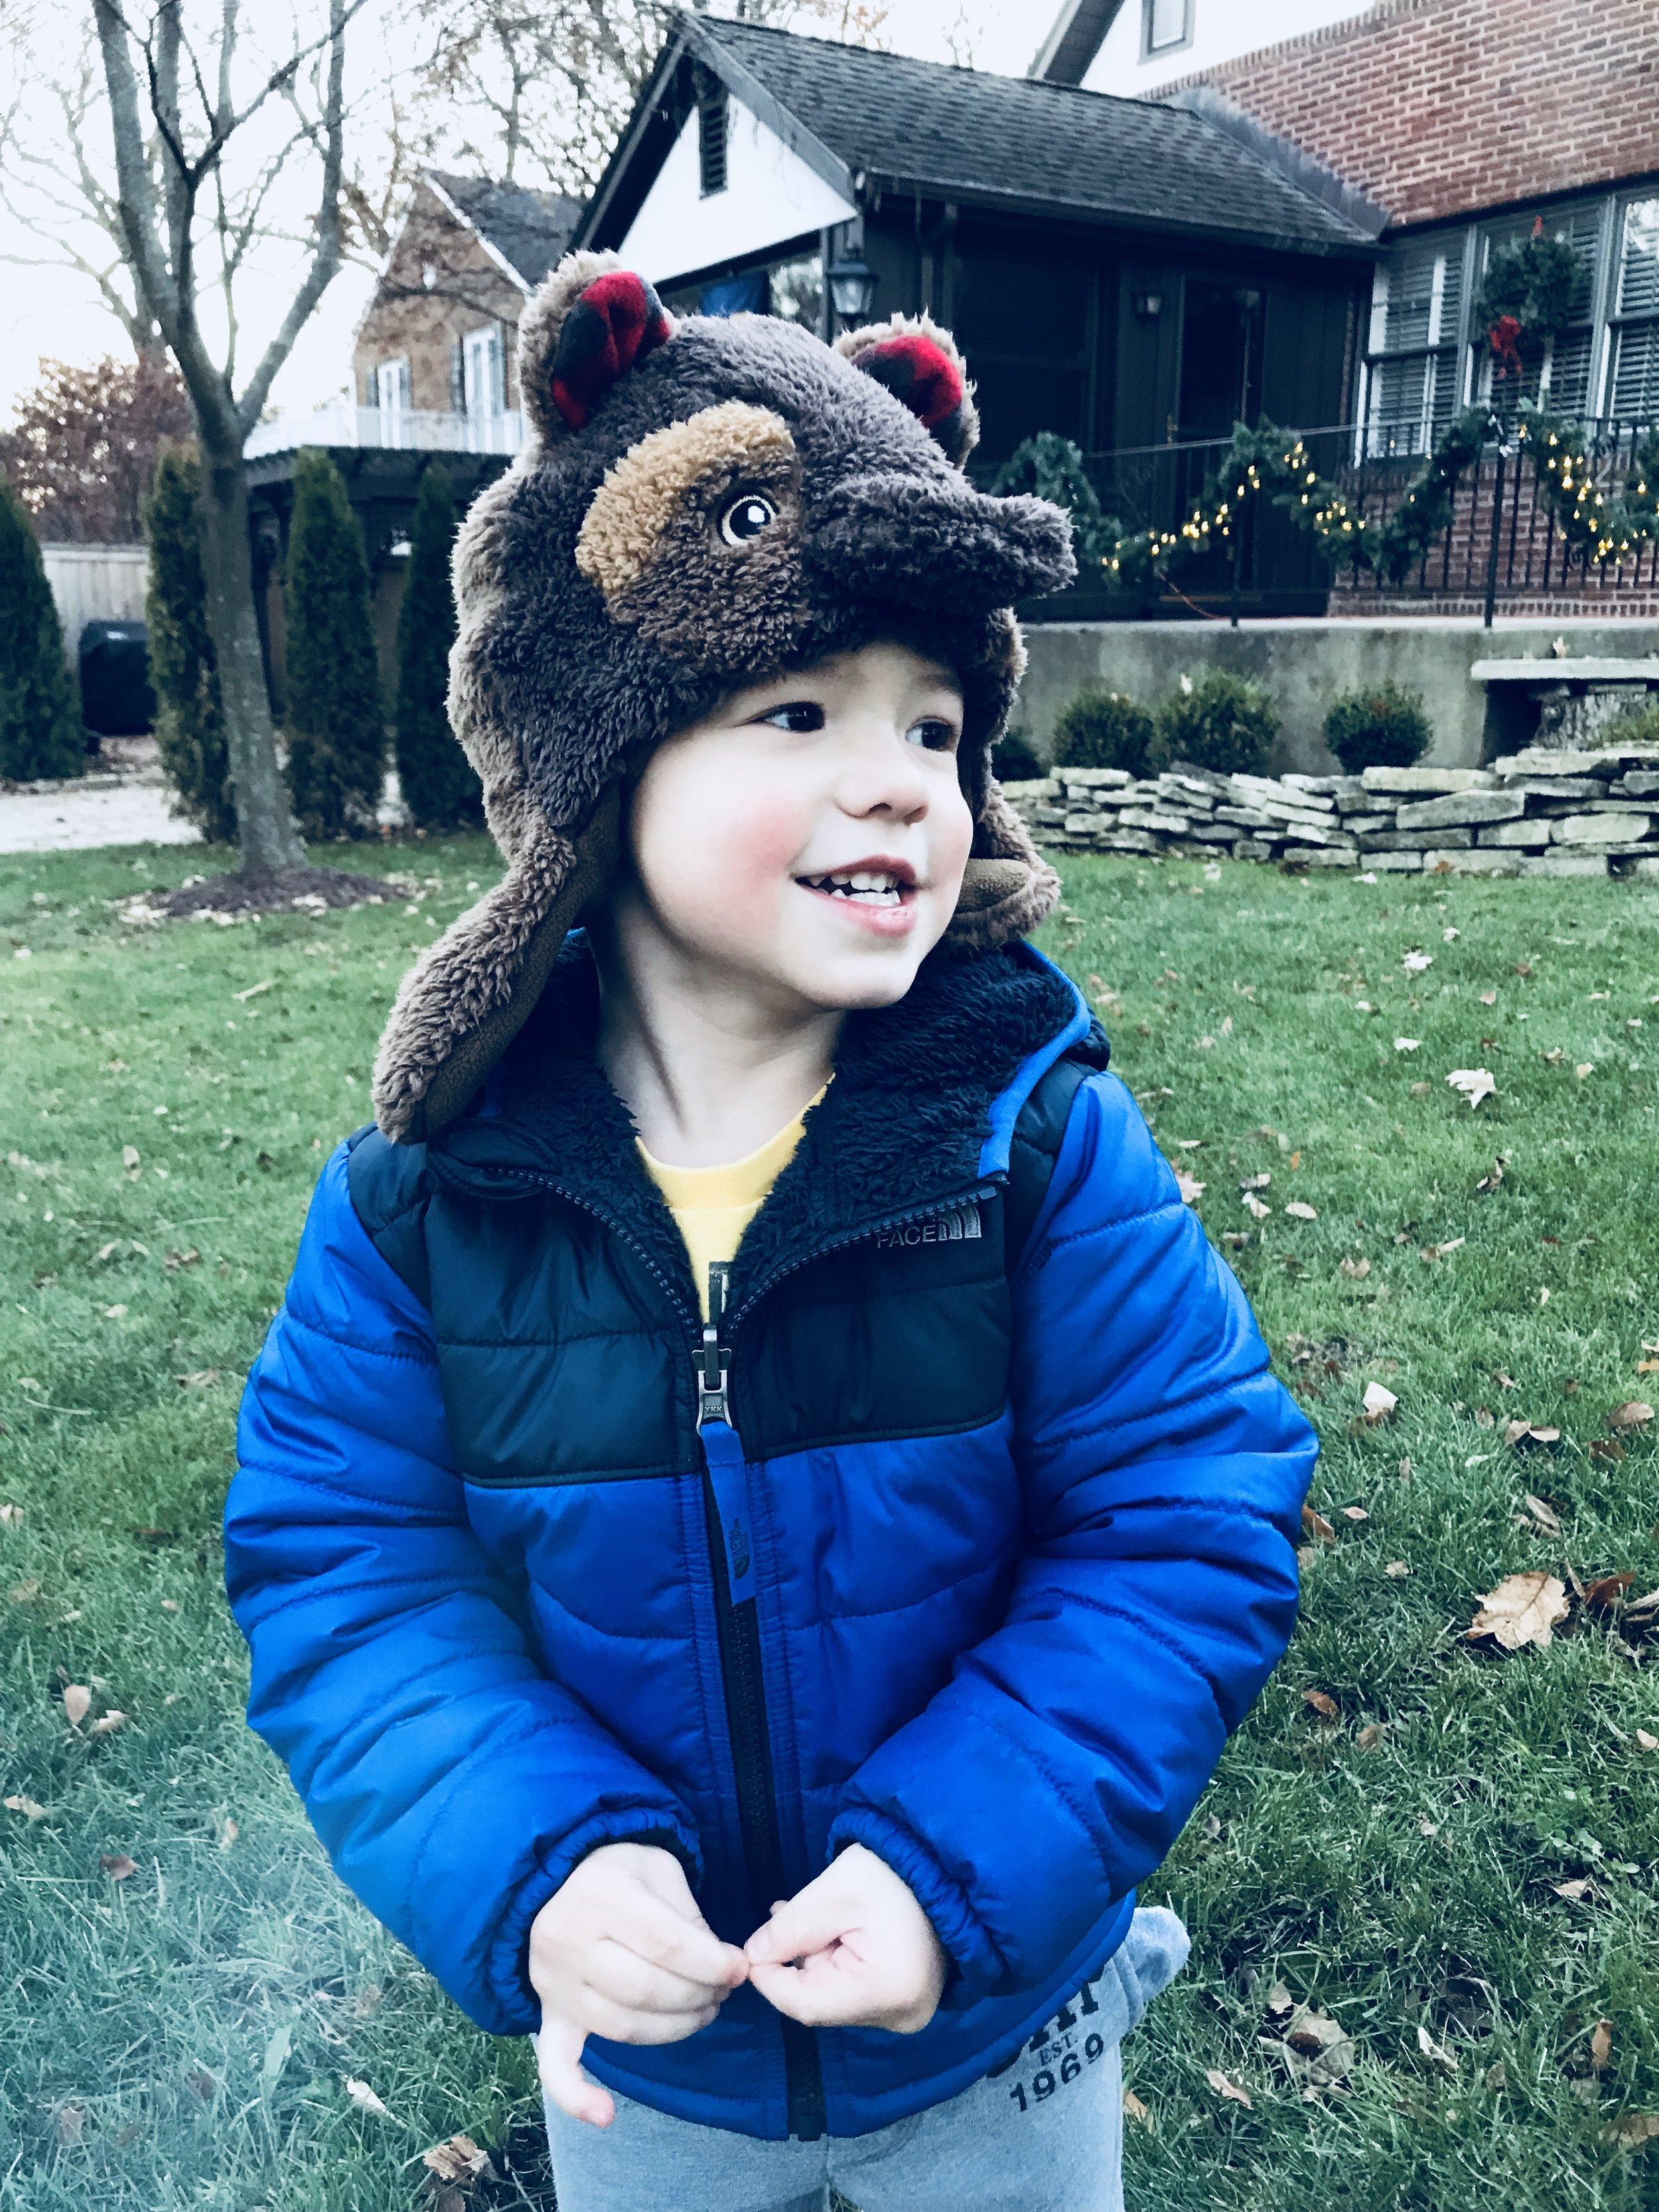 hunter_bear-hat.jpg